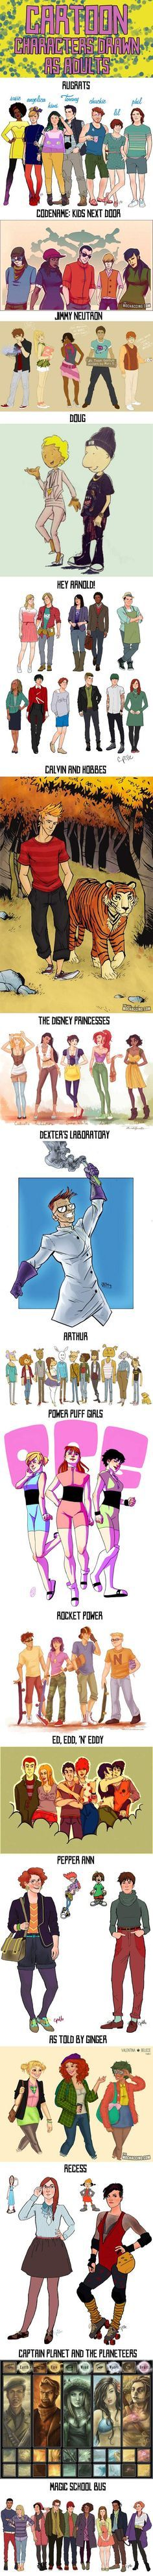 Cartoon characters drawn as adults…